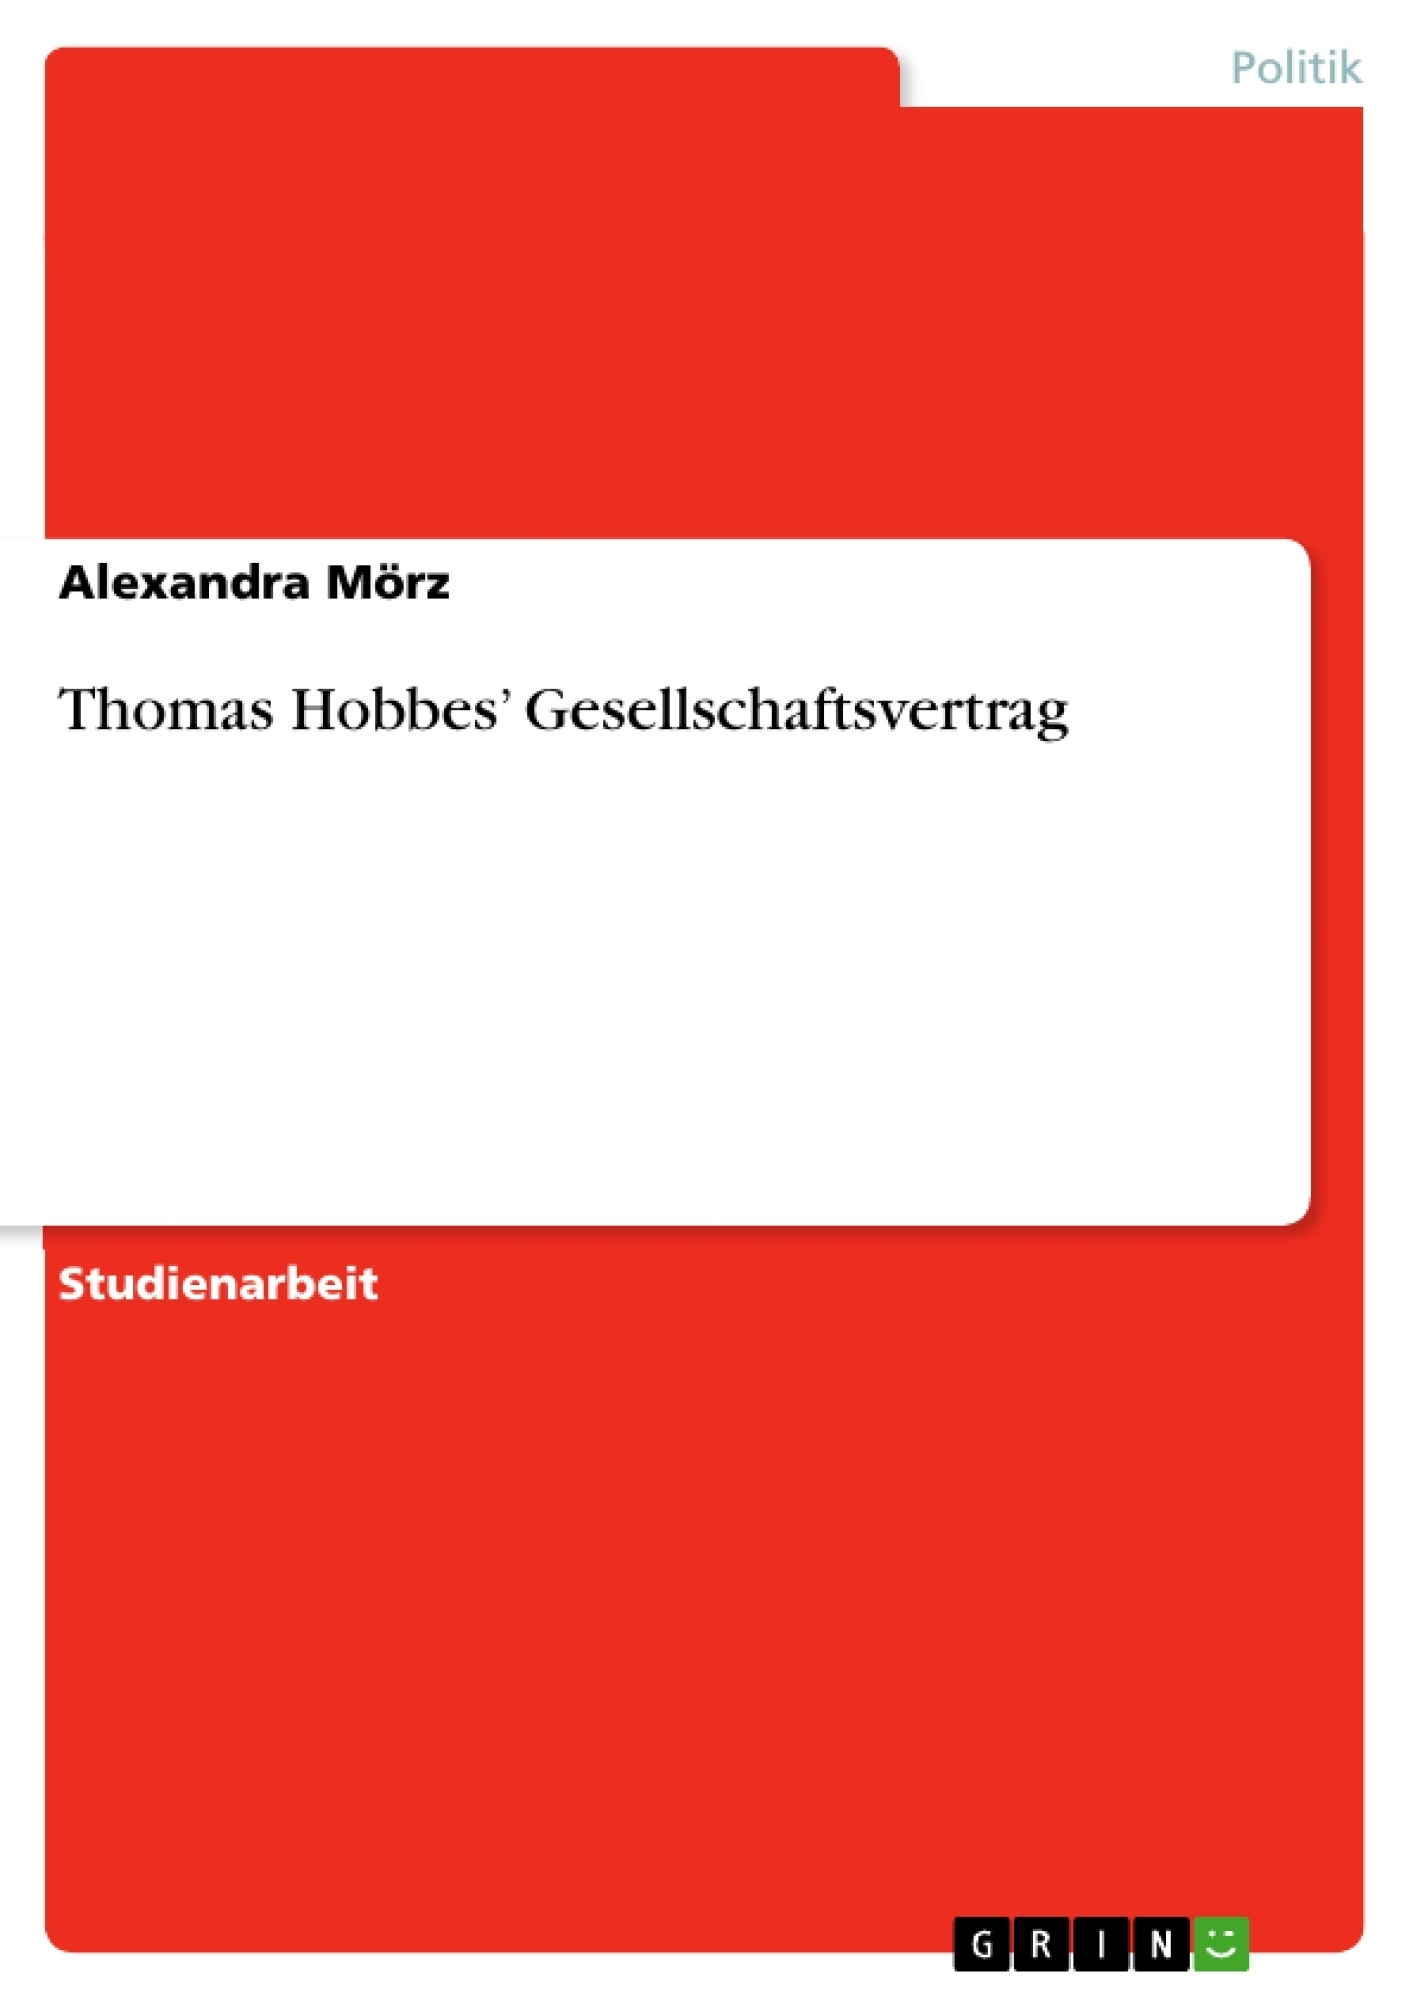 Titel: Thomas Hobbes' Gesellschaftsvertrag